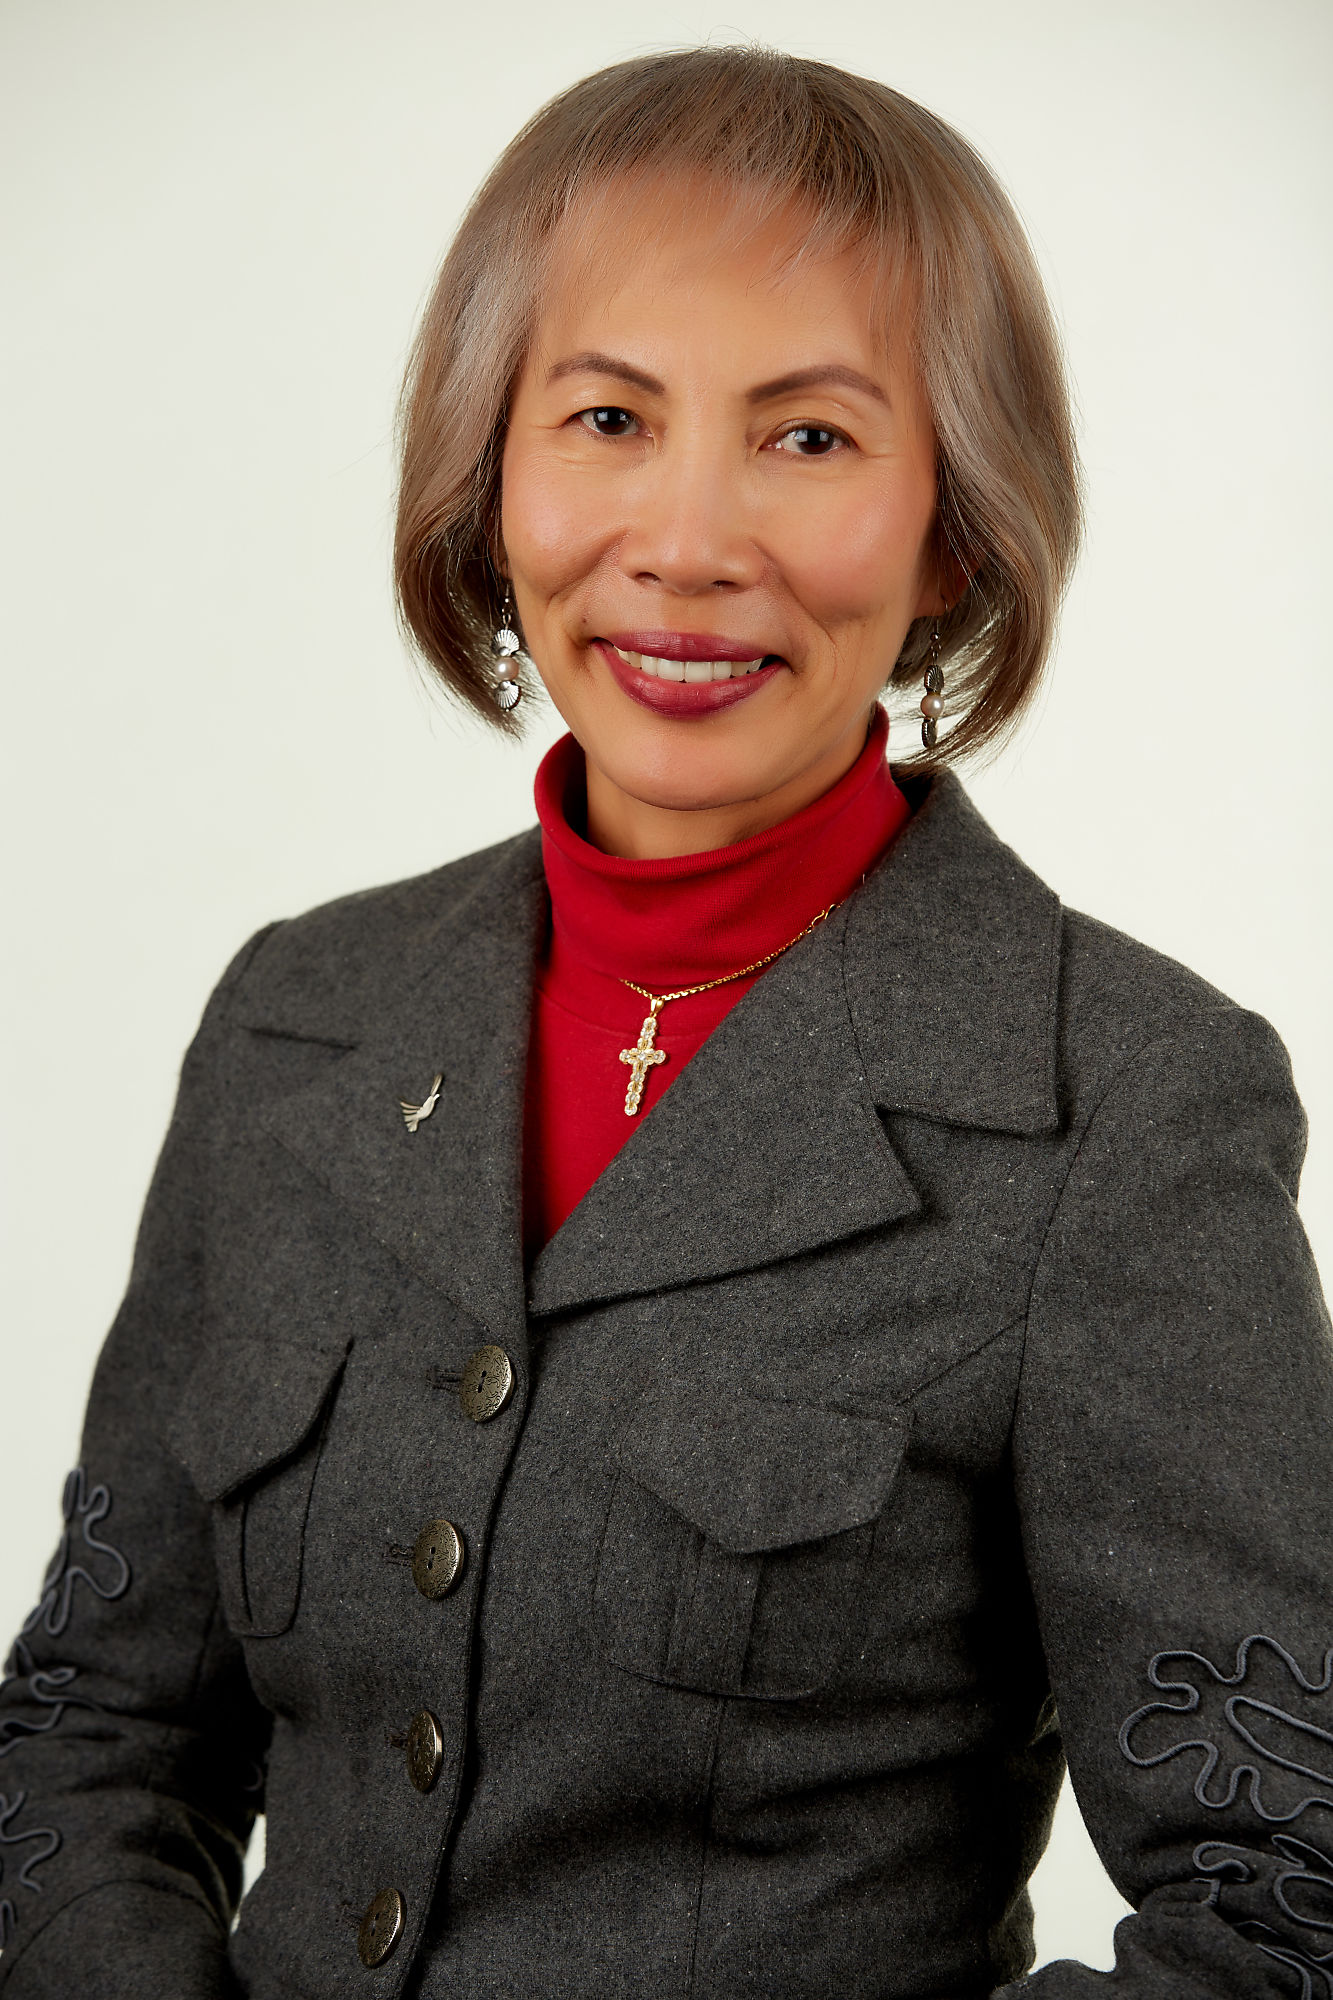 Lailene Leong